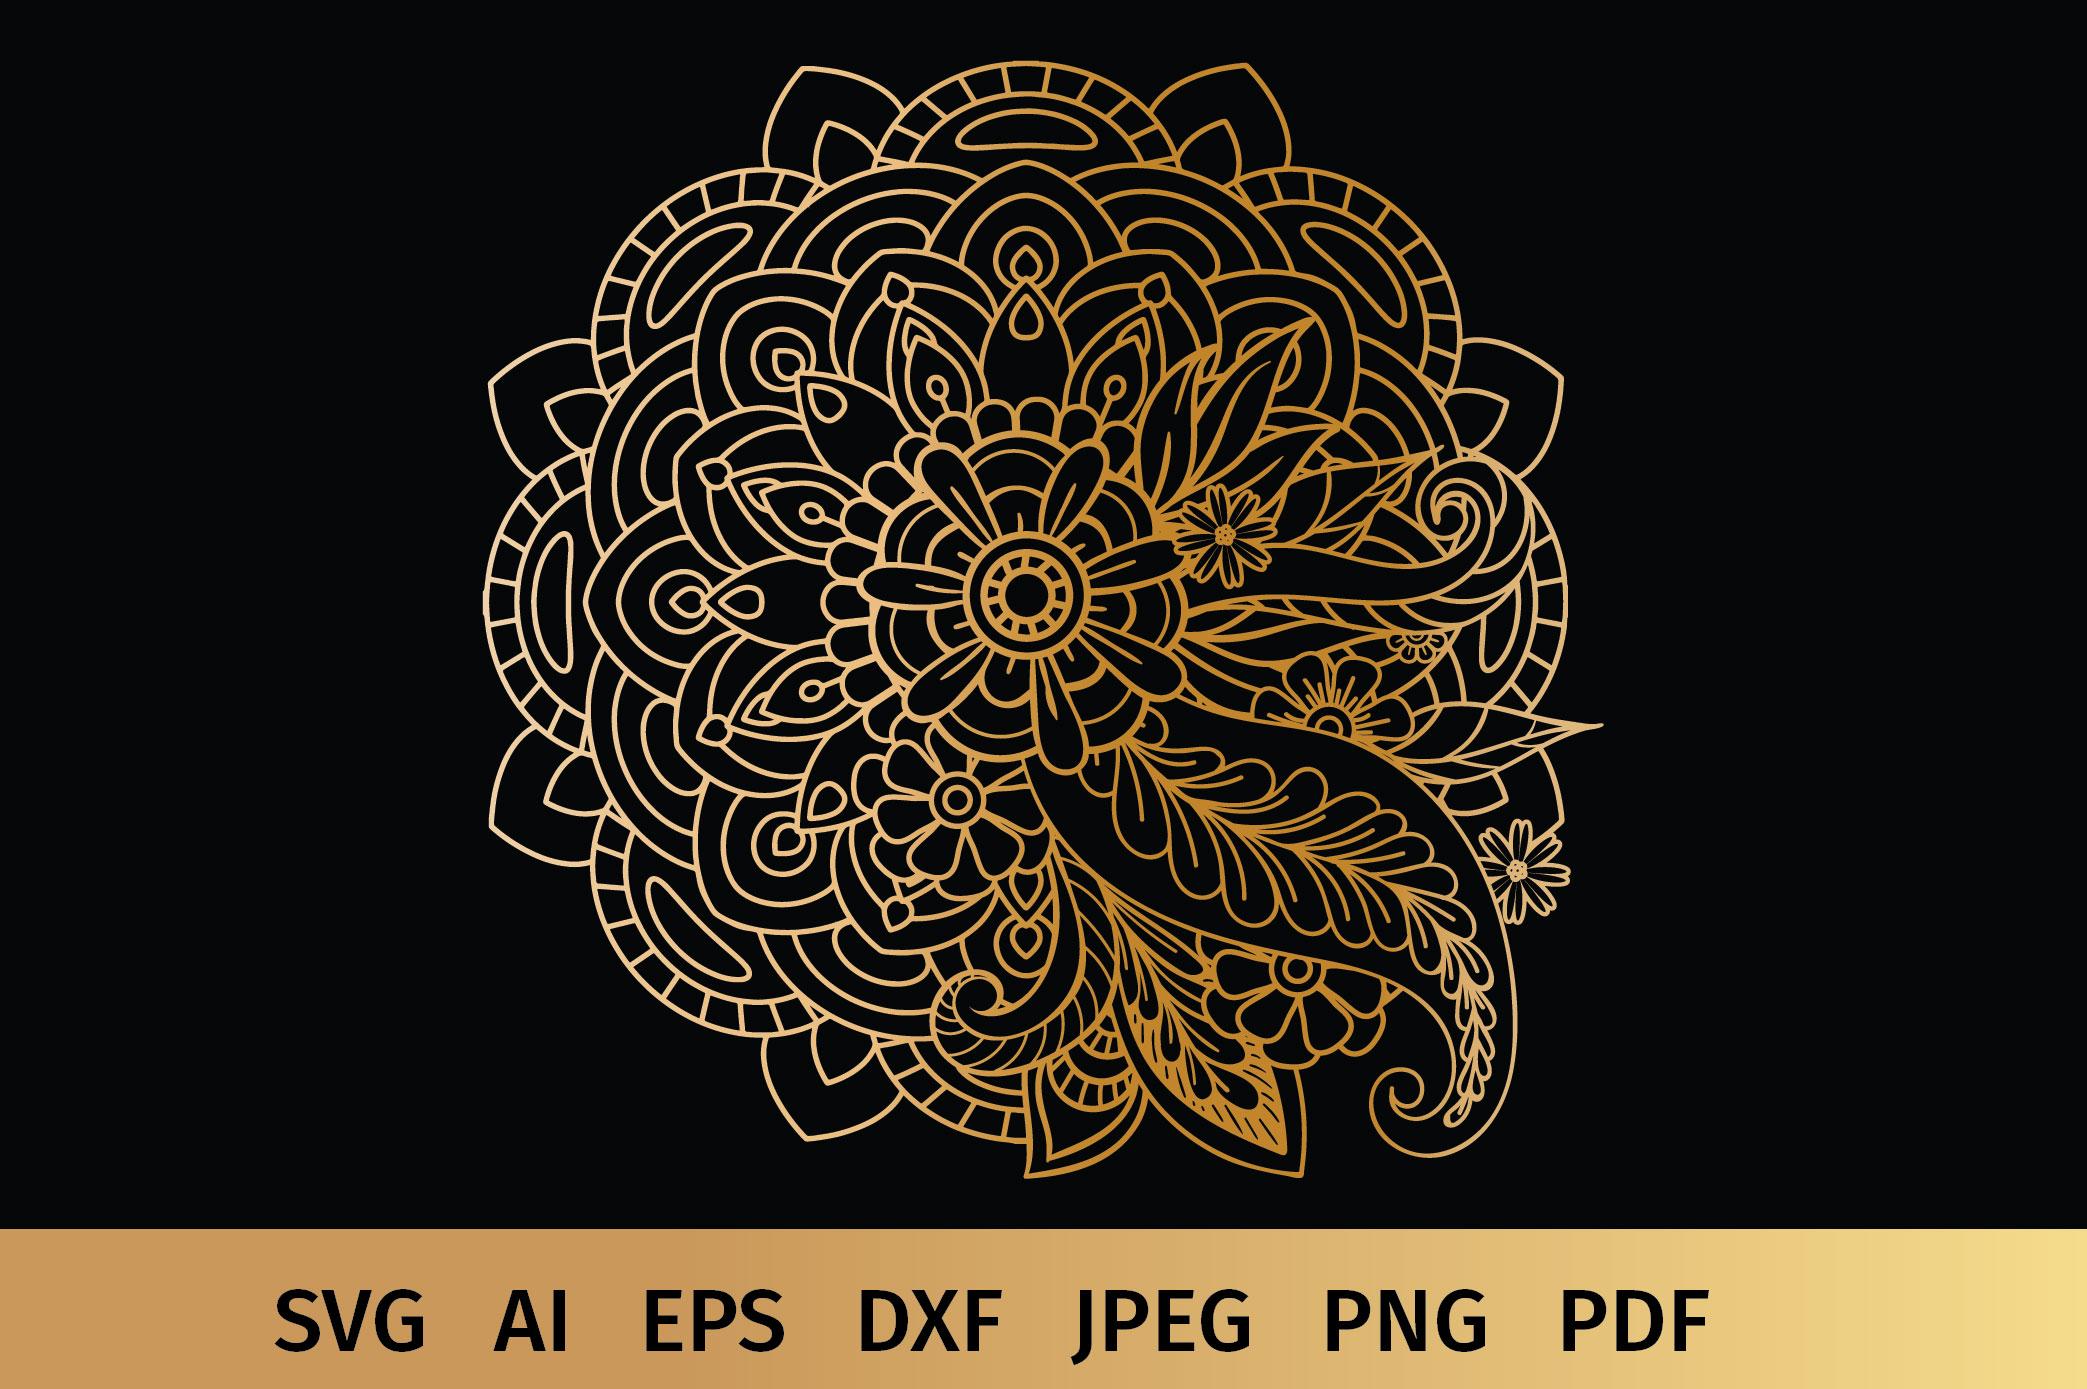 Floral Mandala SVG example image 2